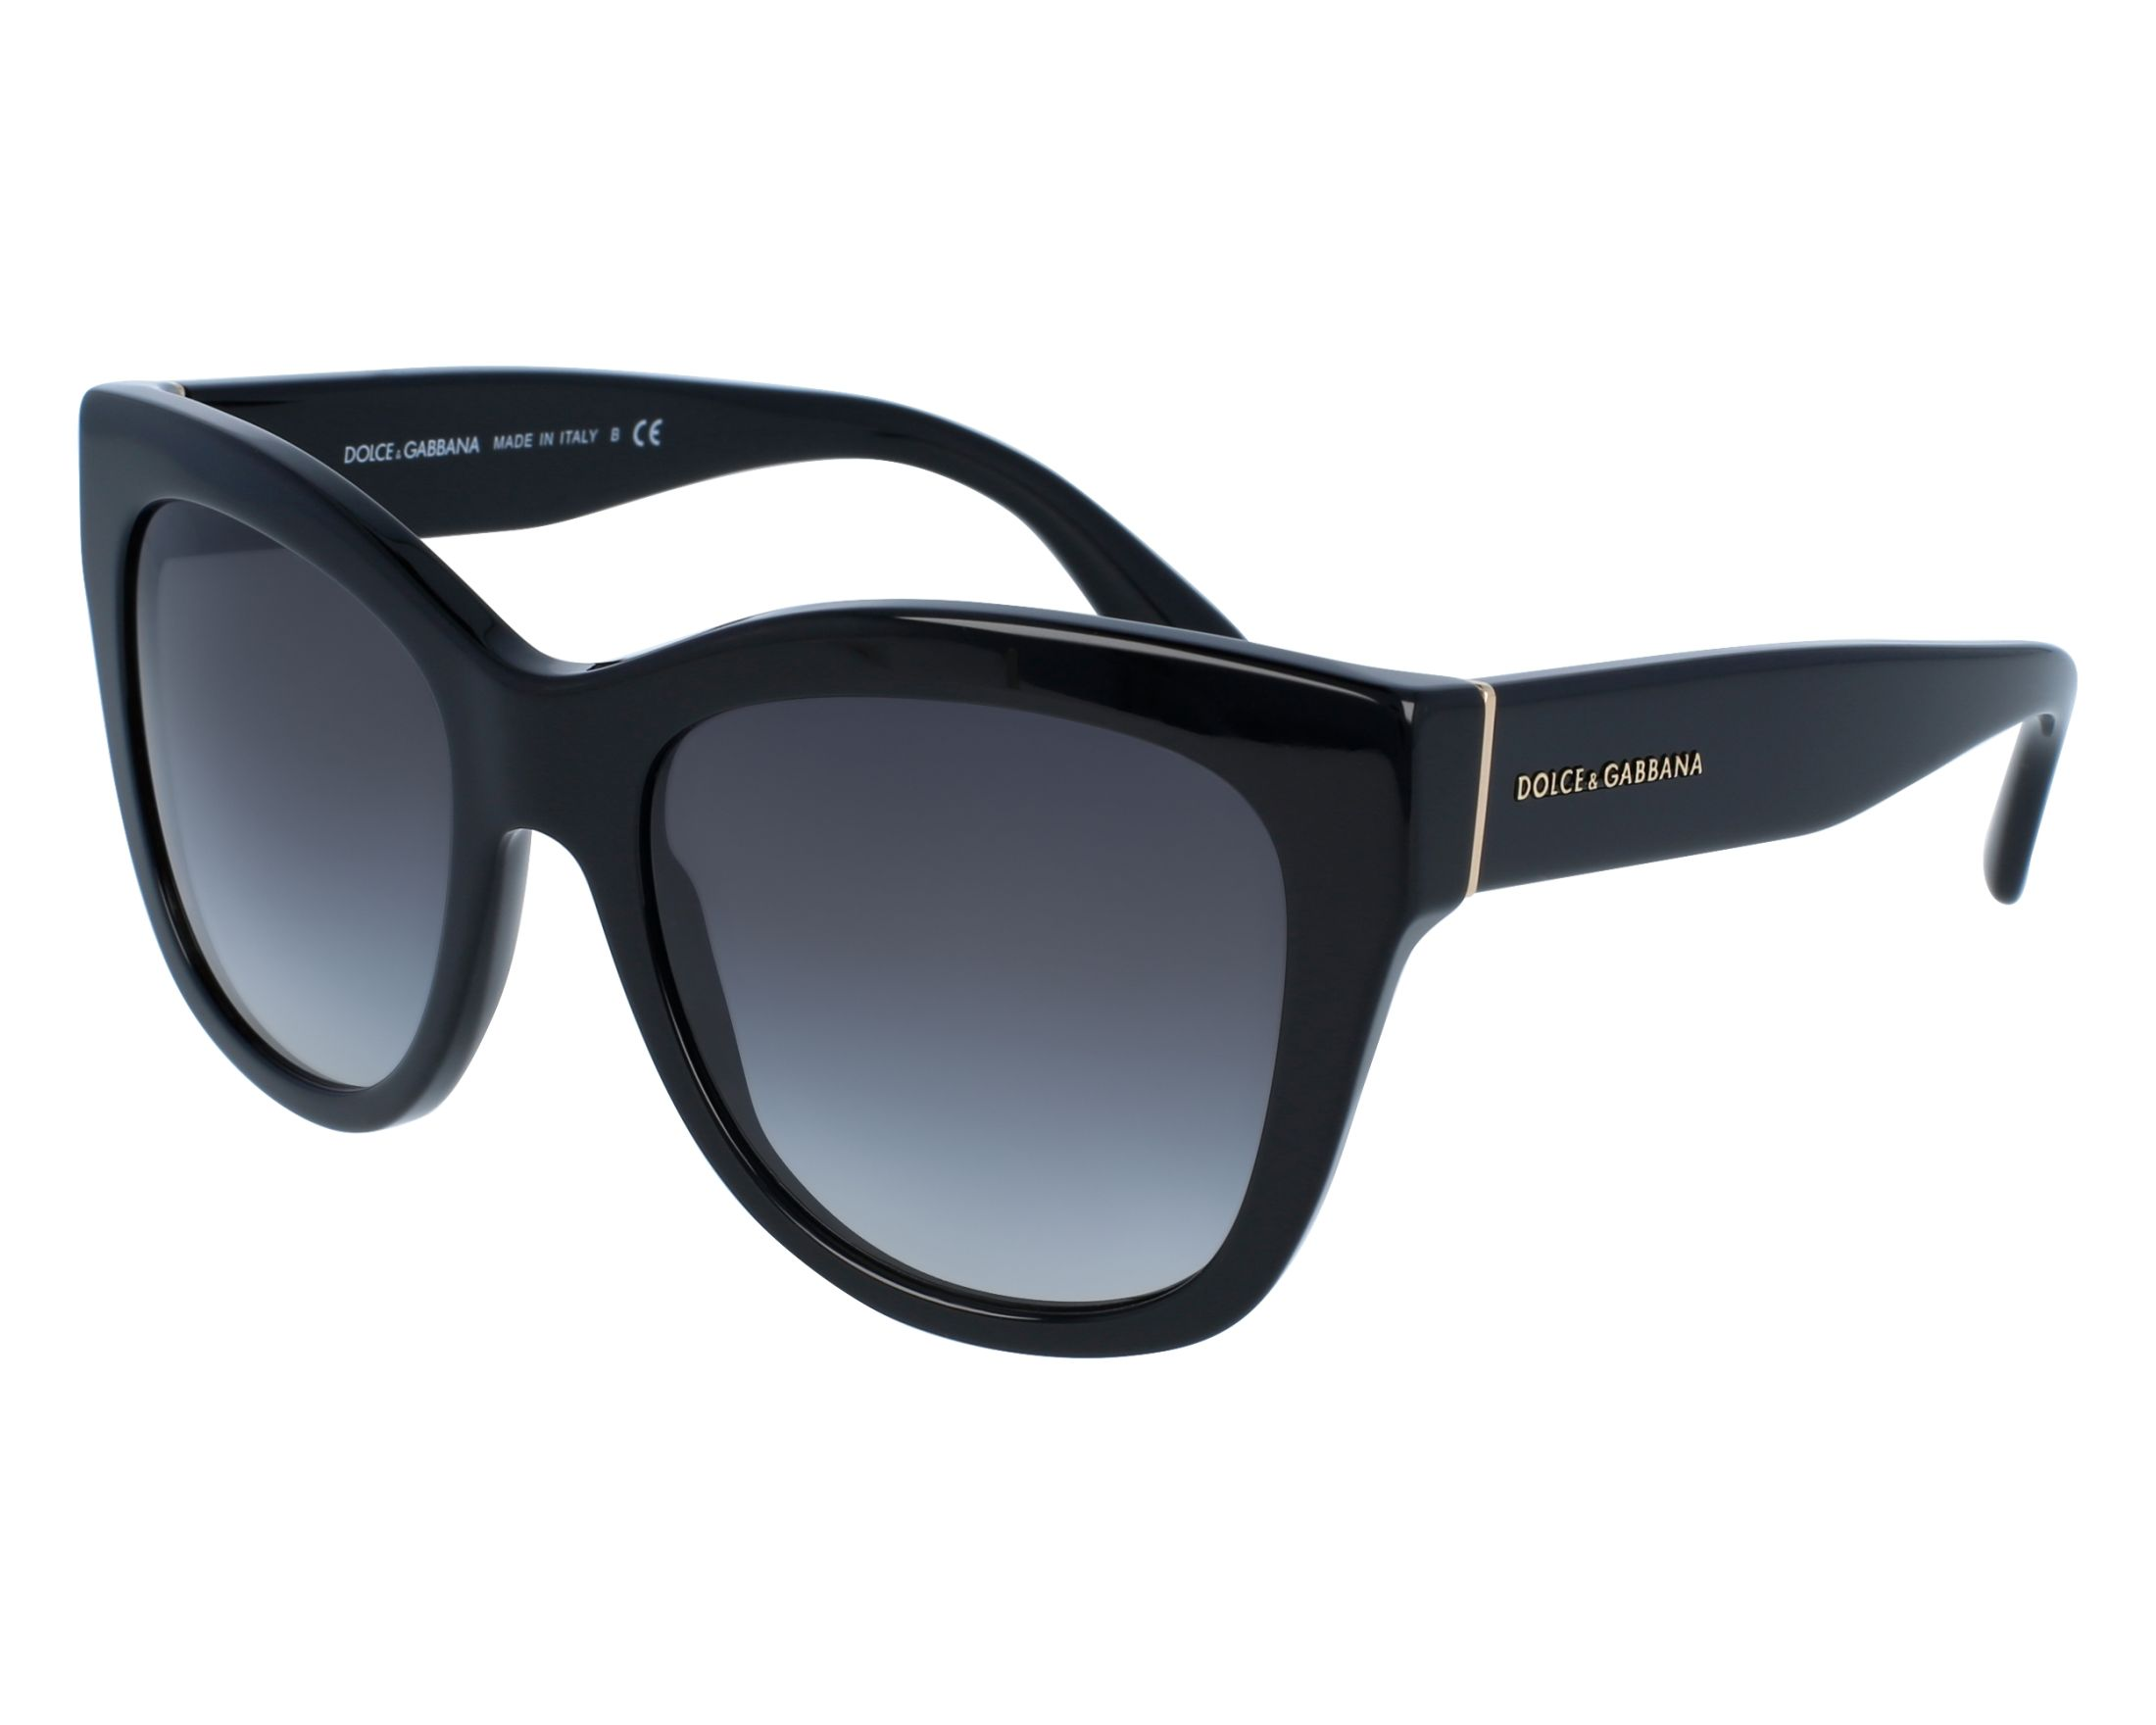 014705a8310 thumbnail Sunglasses Dolce   Gabbana DG-4270 501 8G - Black front view